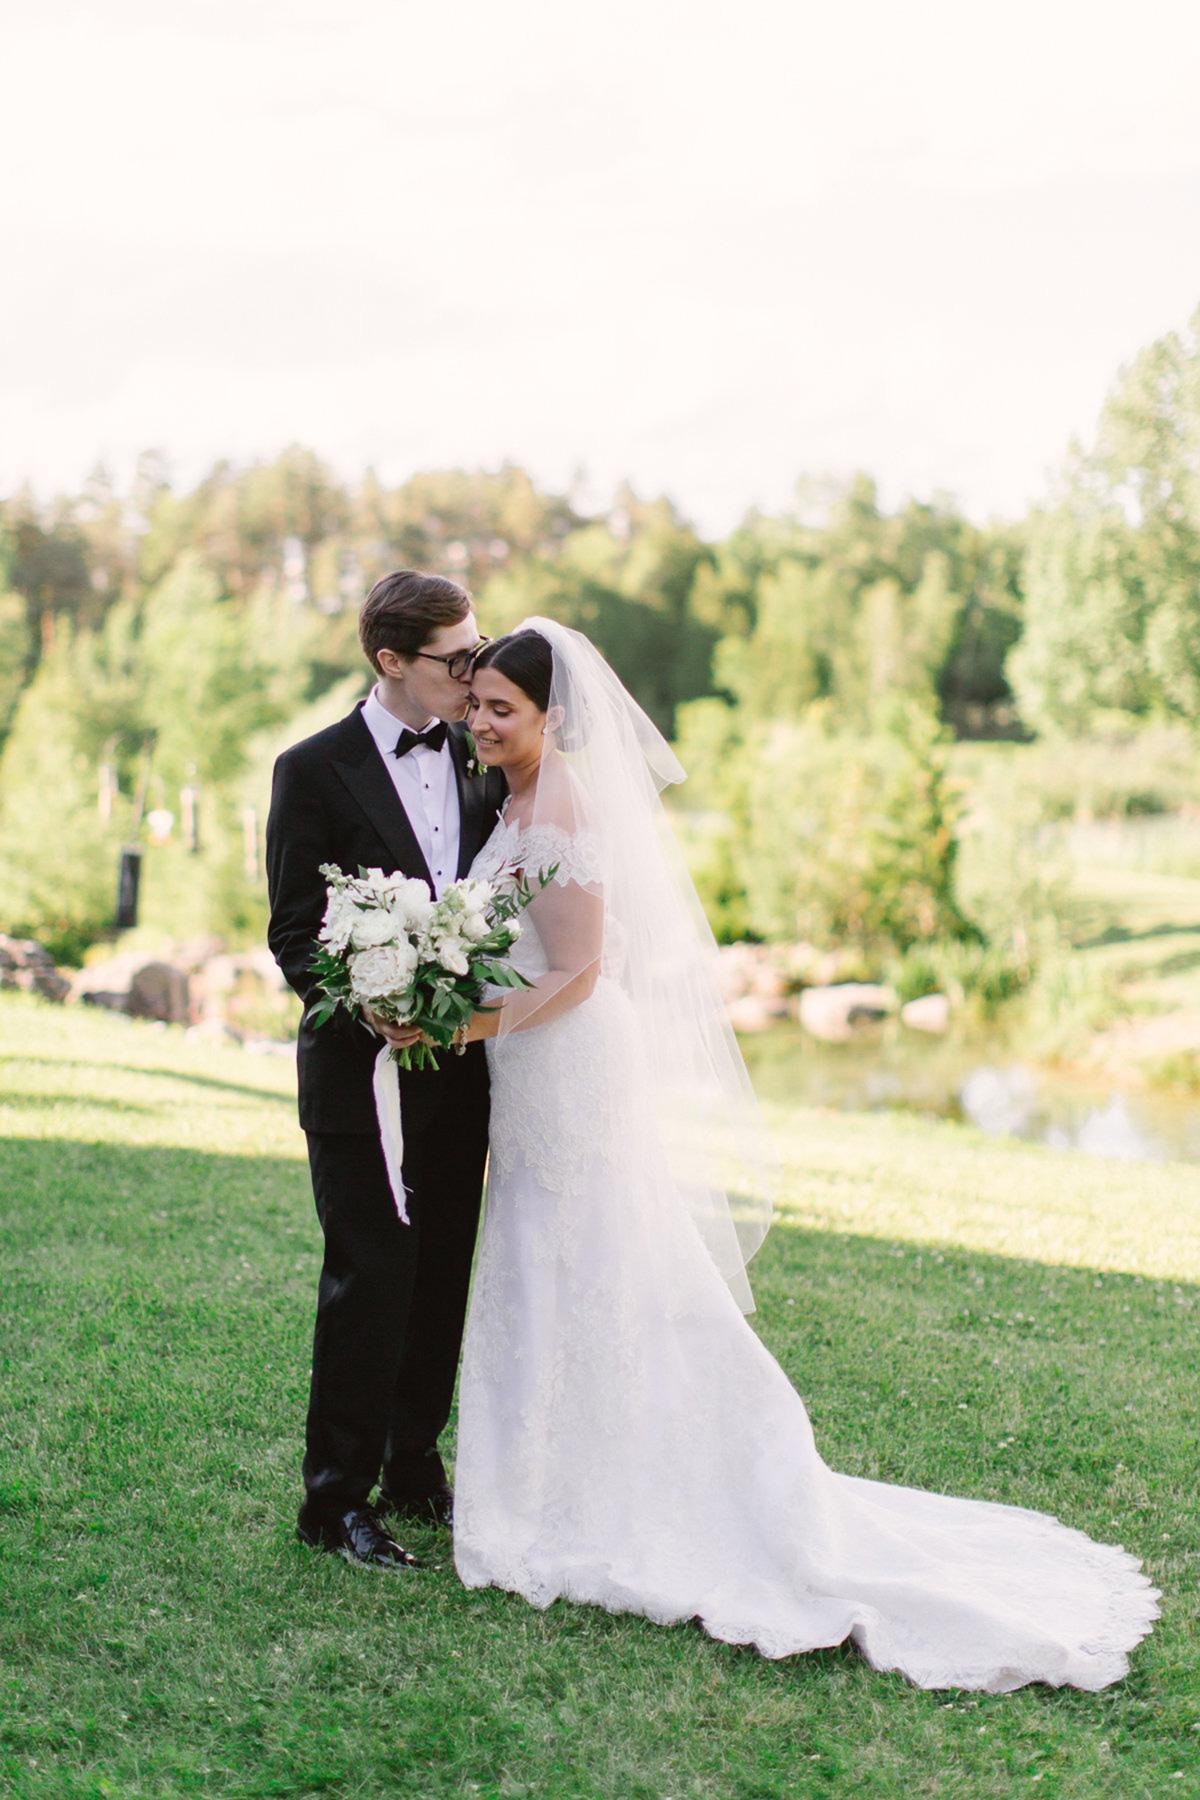 artiese-studios-vineyard-bride-swish-list-private-estate-cambridge-wedding-8.jpg